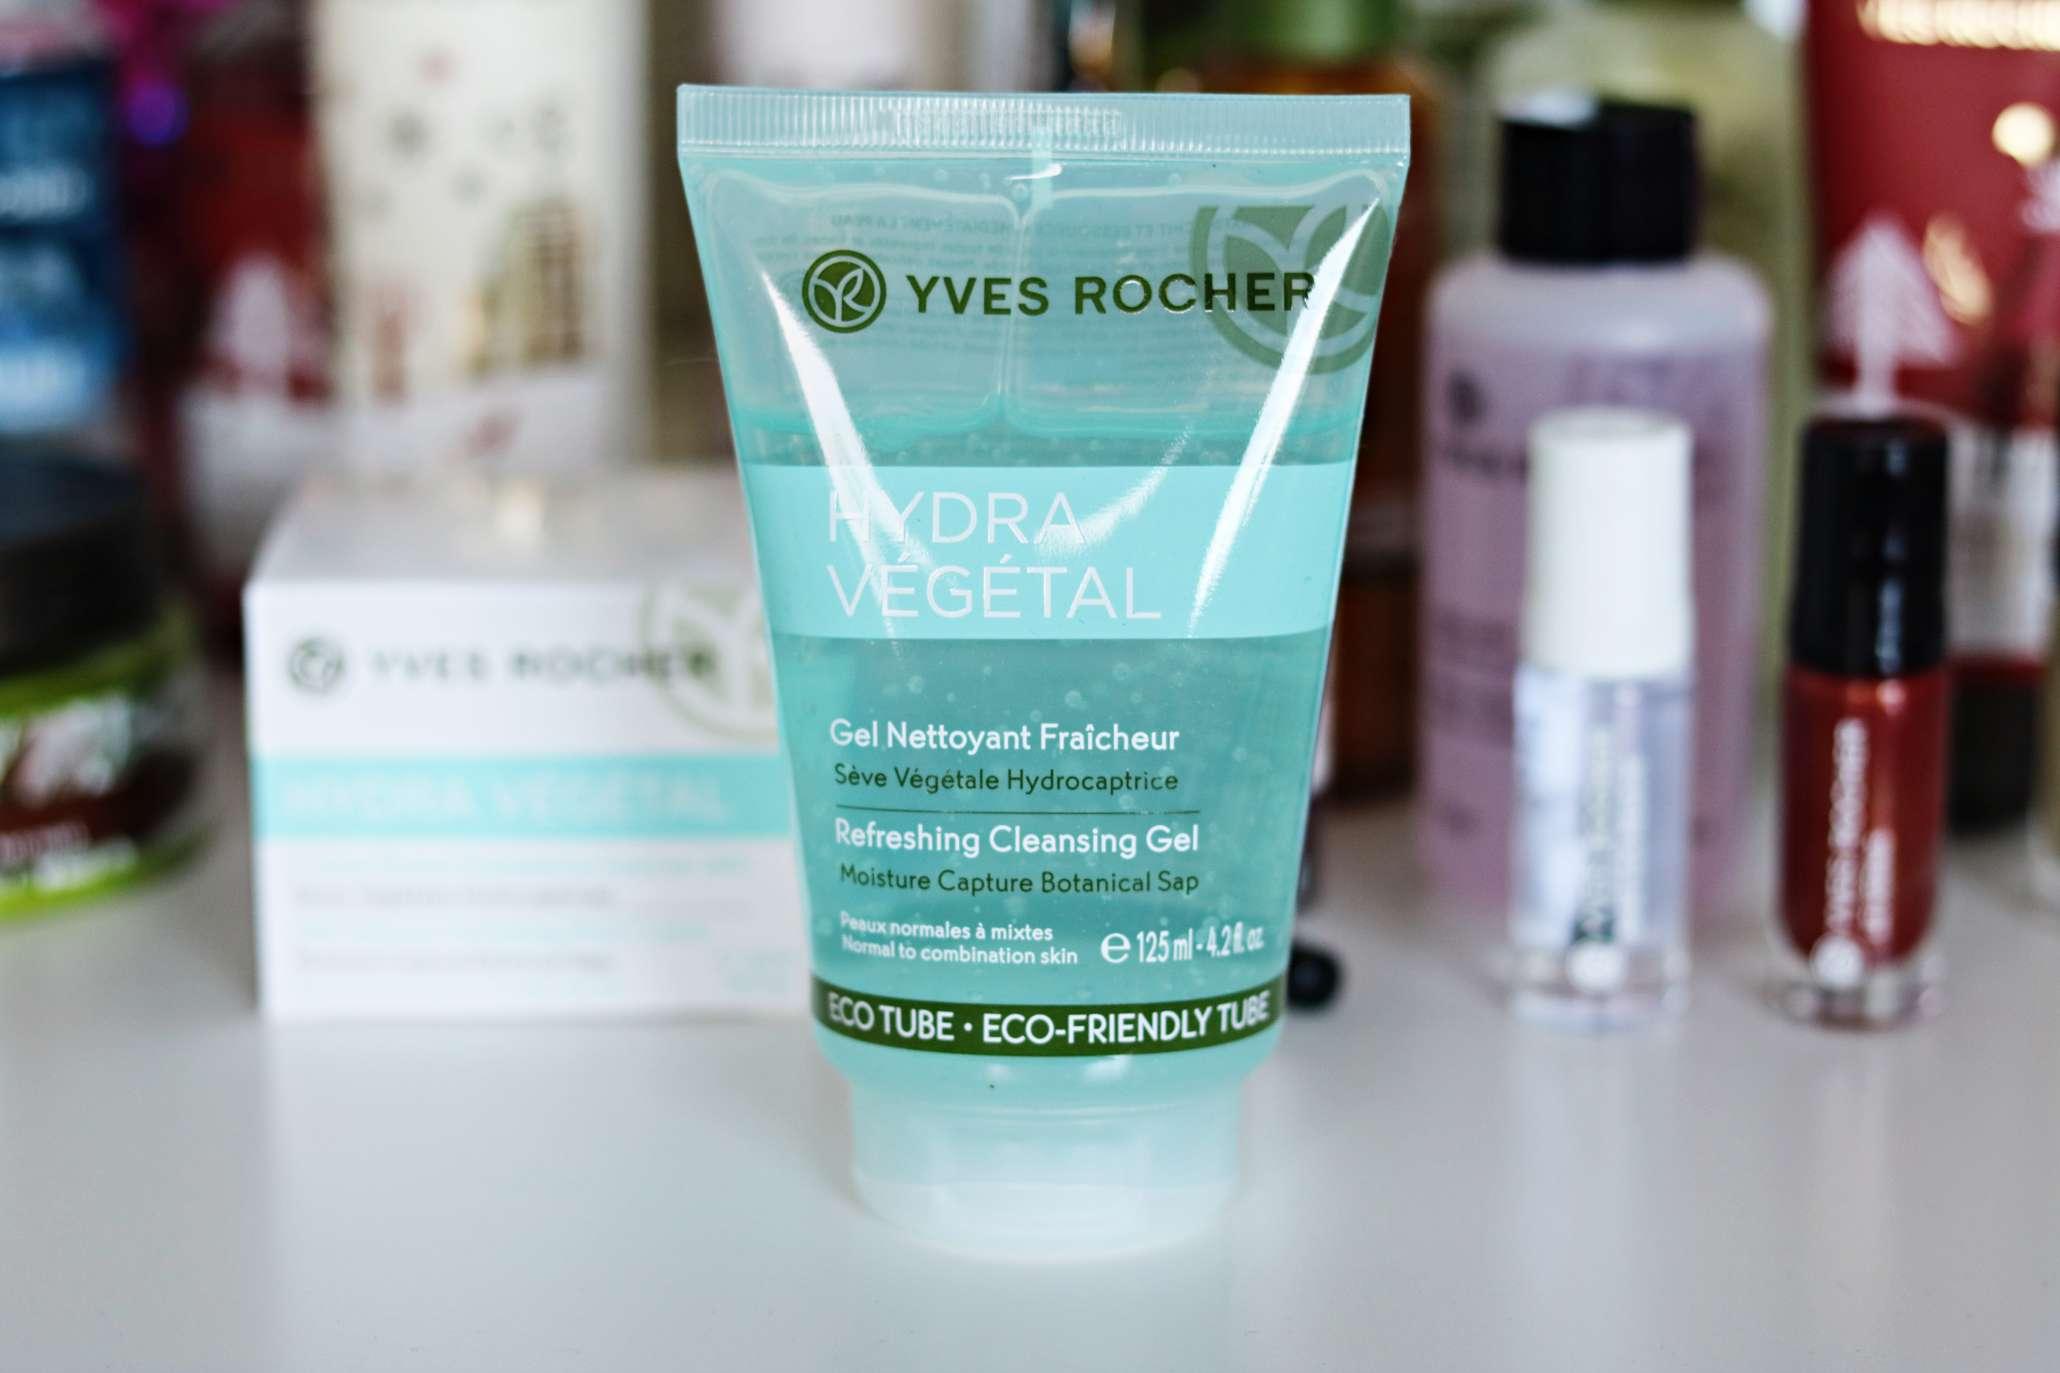 Yves Rocher Hydra Vegetal Refreshing Cleansing Gel